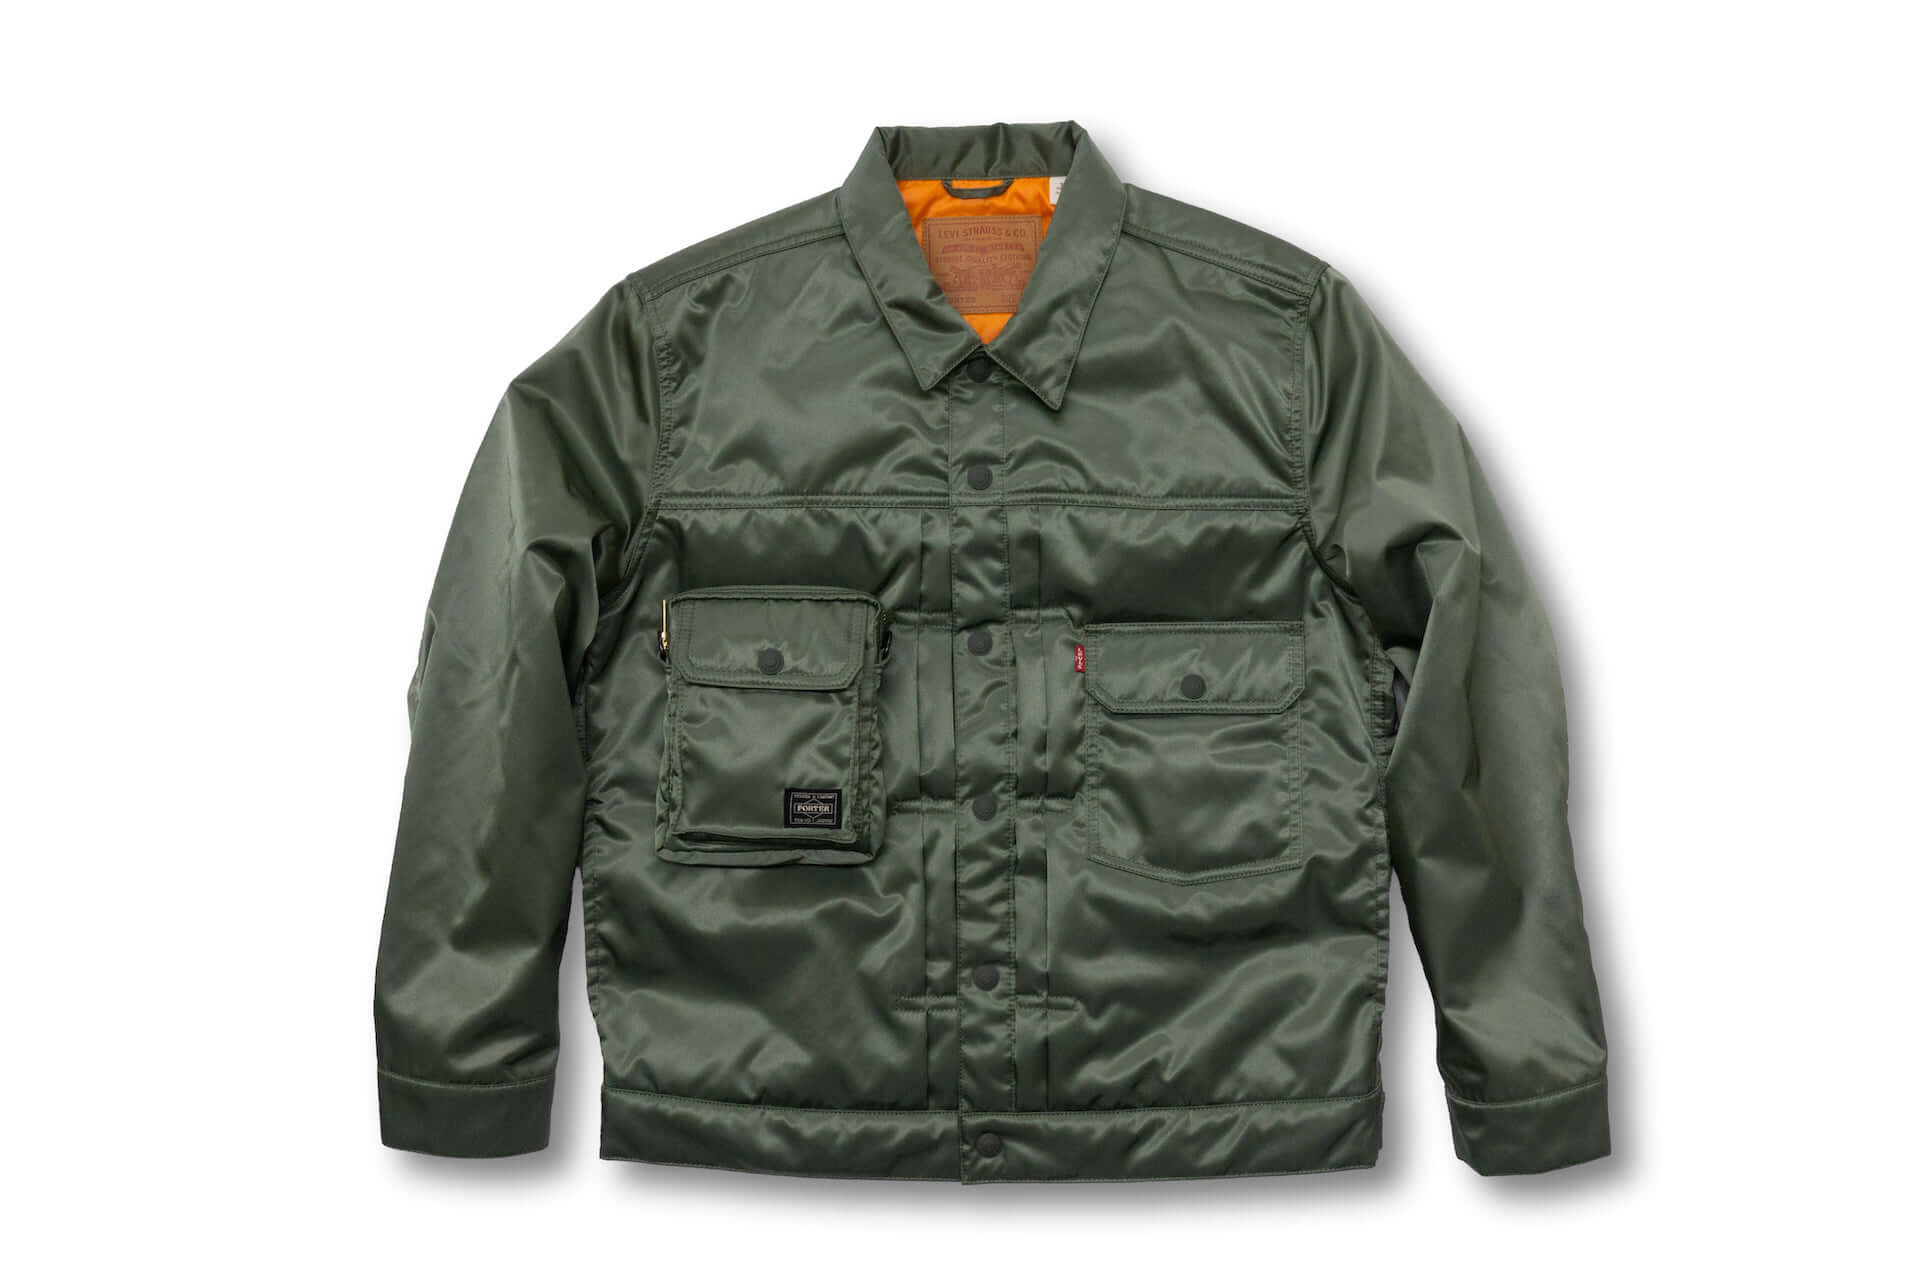 Levi's®︎とPORTERのコラボによる限定トラッカージャケットが発売決定!吉田カバン創業85周年記念モデル lf201020_levis-porter_1-1920x1279